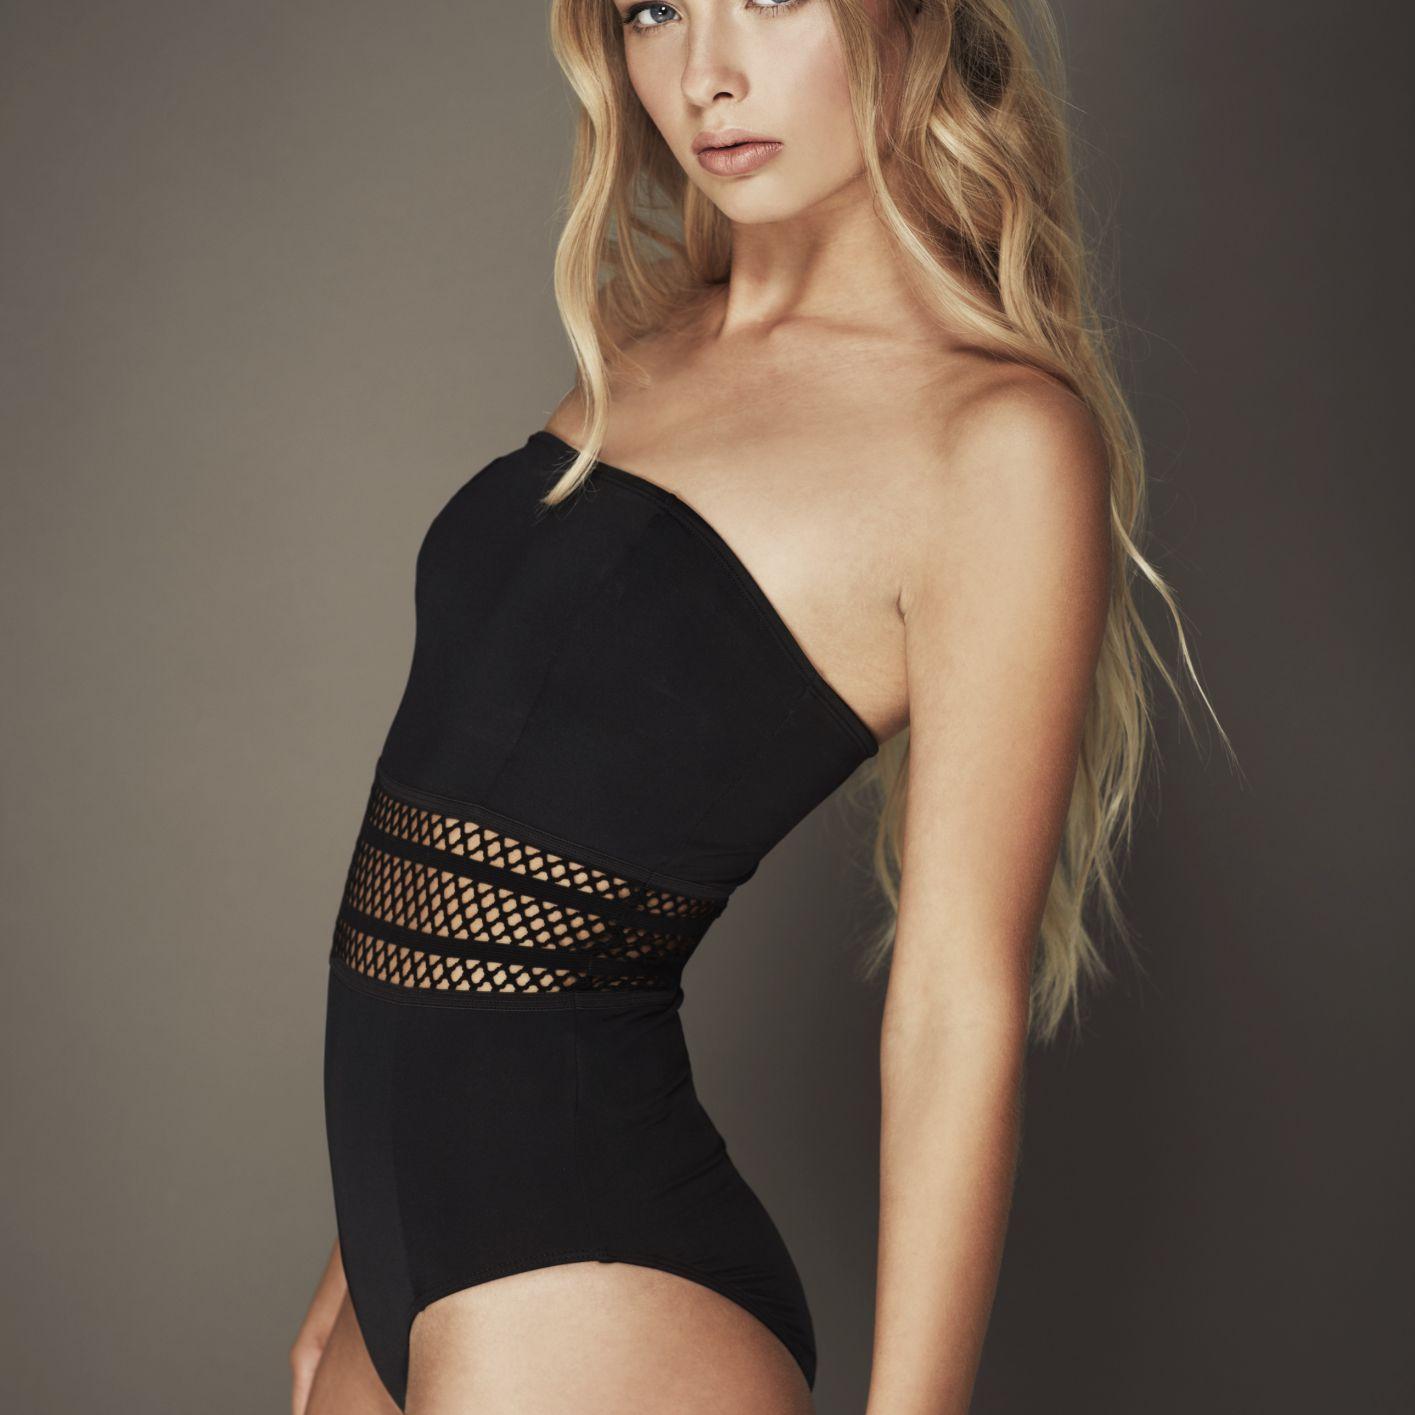 Modeling Portfolio Swimsuit Bathing Suit Photograph